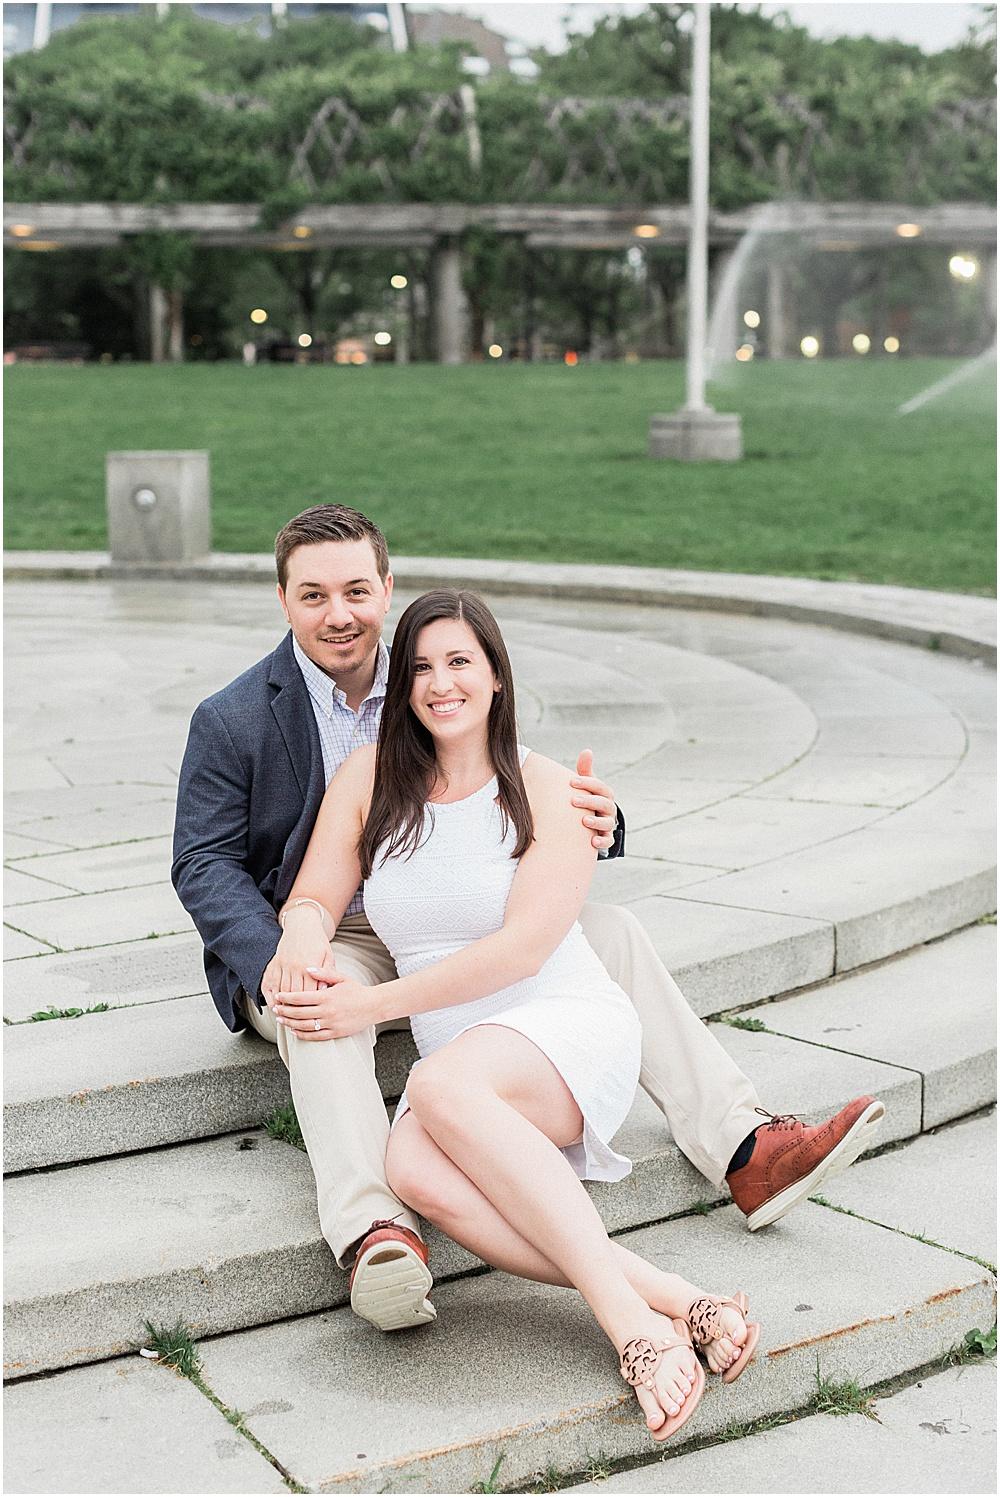 christopher_columbus_park_north_end_harbor_engagement_session_massachusetts_boston_wedding_photographer_meredith_jane_photography_photo_0433.jpg